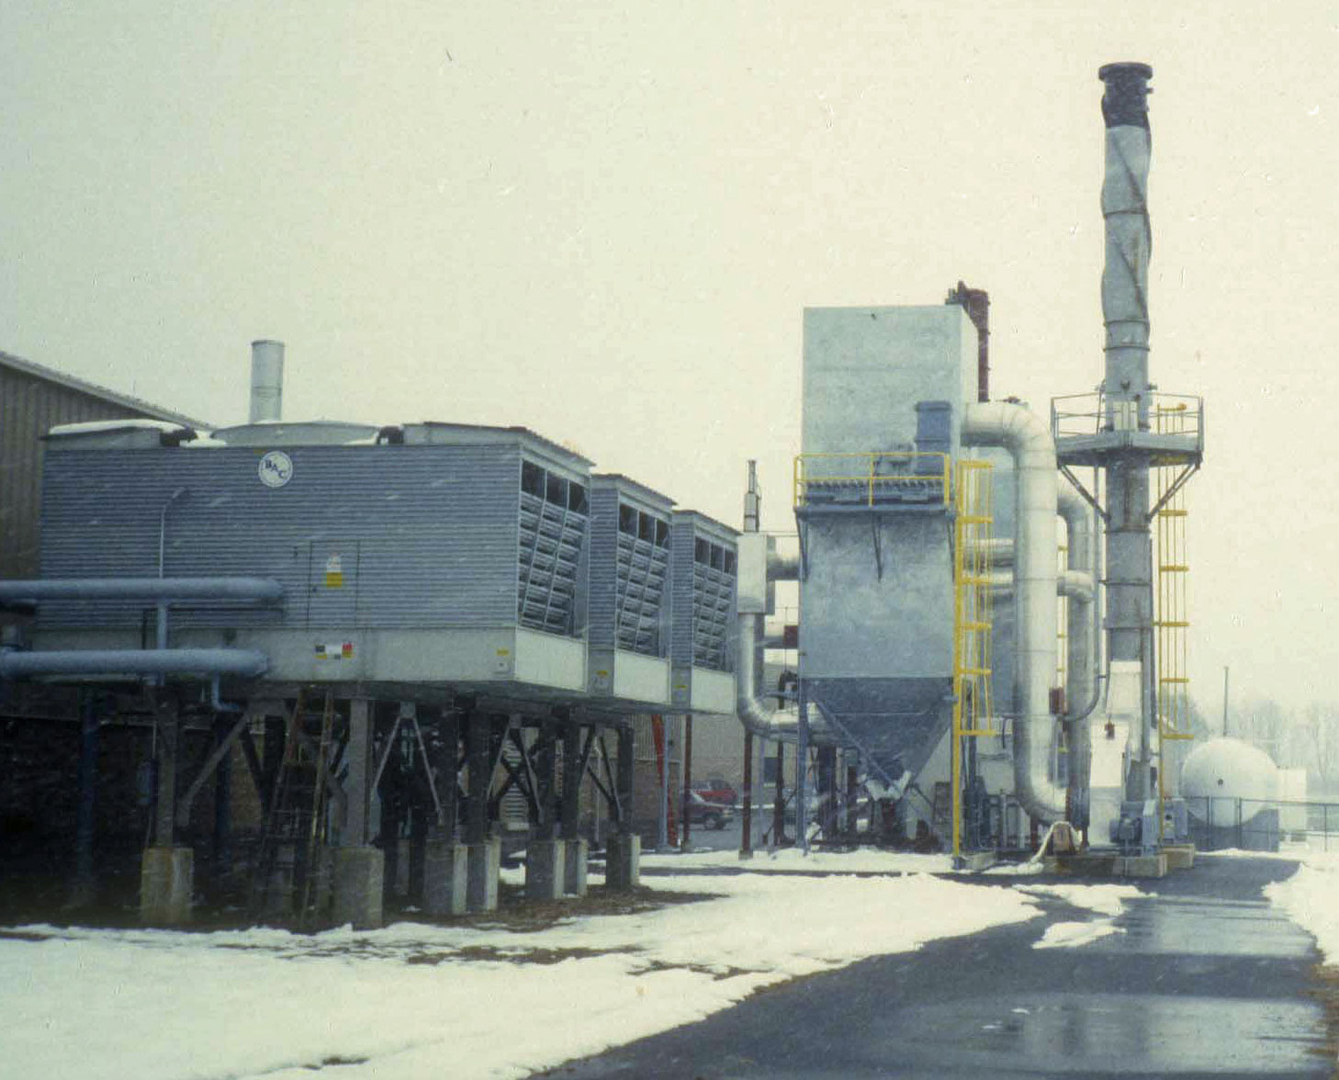 Houtzdale Micronized Coal Plant.jpg